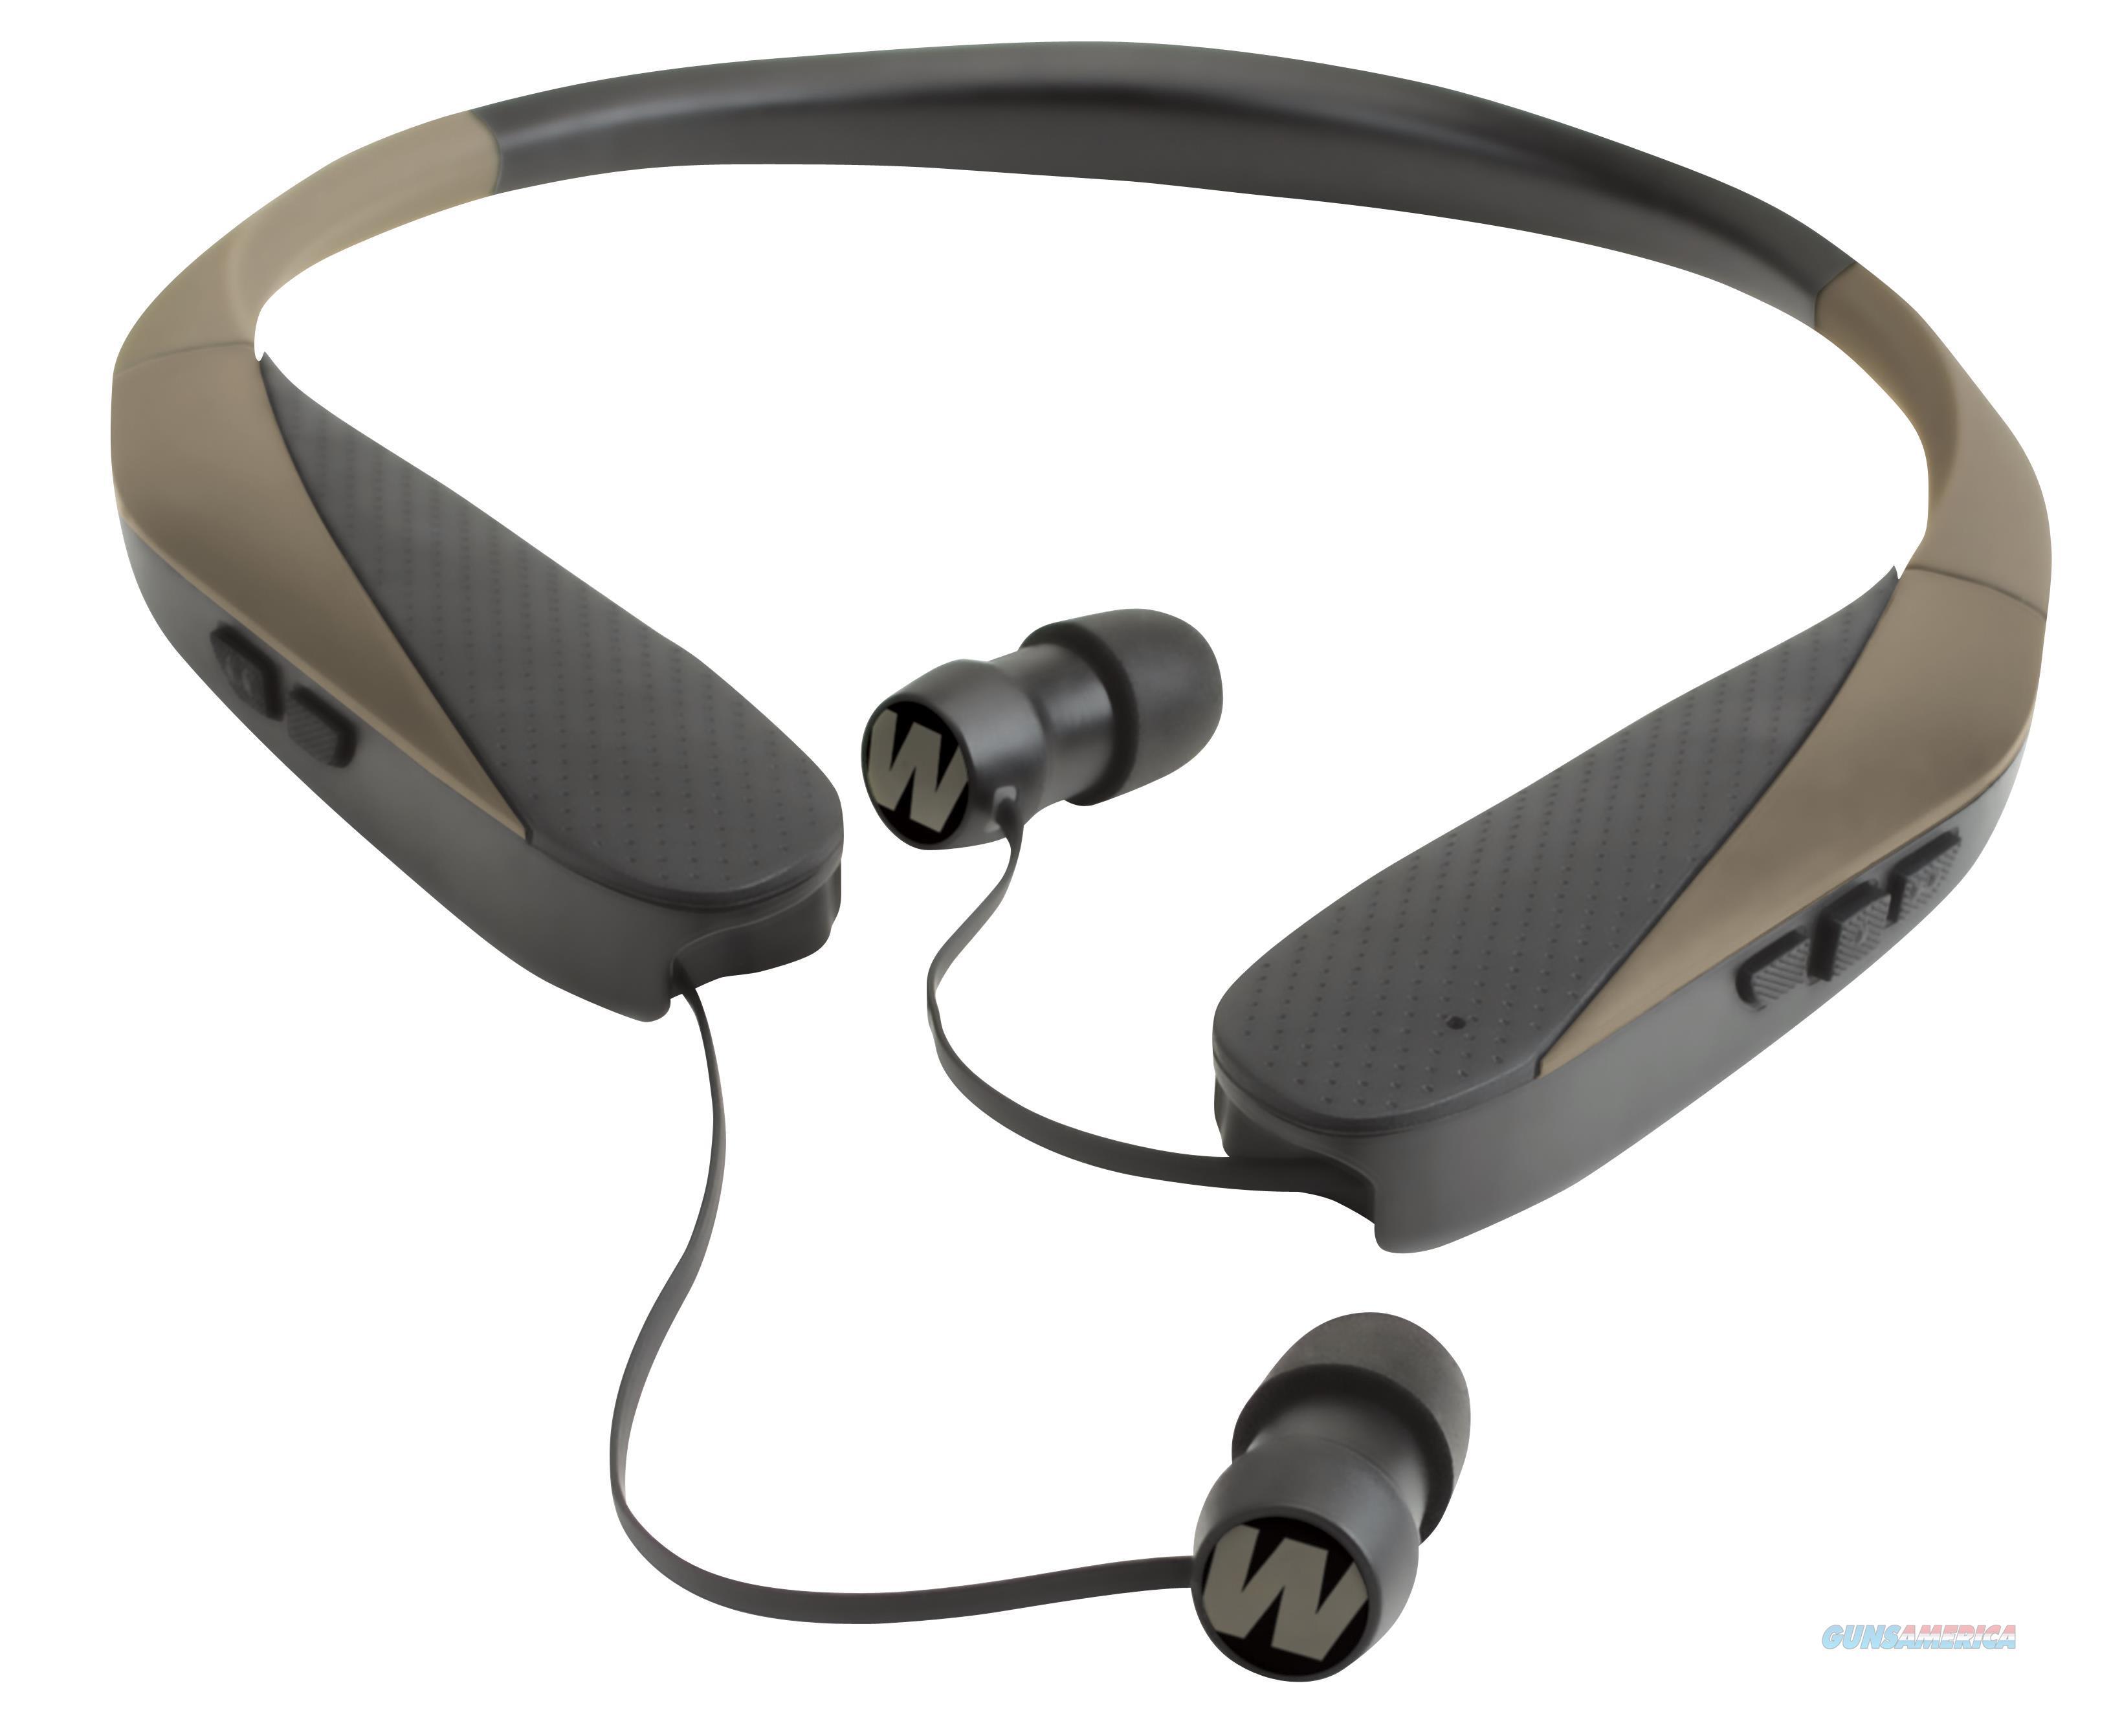 Walkers Game Ear Gwpnhebt Razor Xv W/Bluetooth Electronic 31 Db Flat Dark Earth GWPNHEBT  Non-Guns > Hunting Clothing and Equipment > Clothing > Camo Outerwear